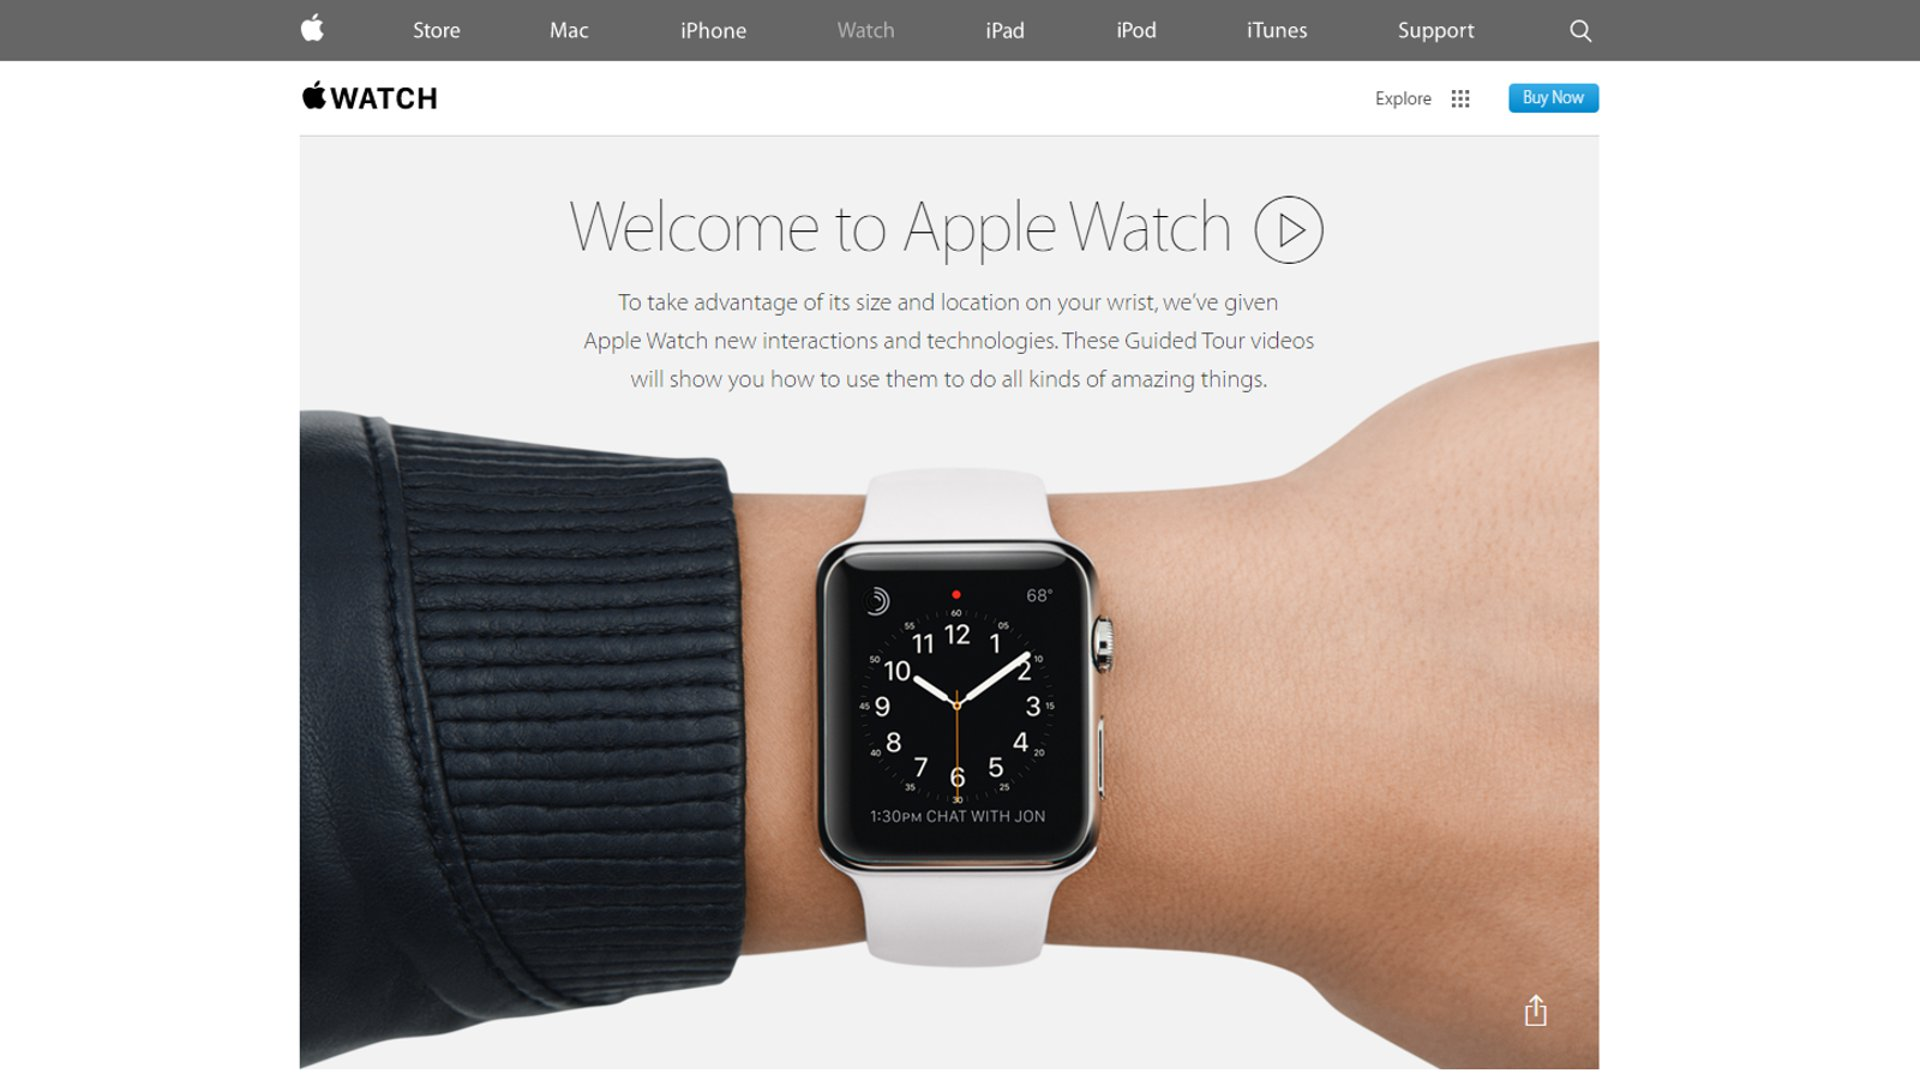 Apple Watch - Videos